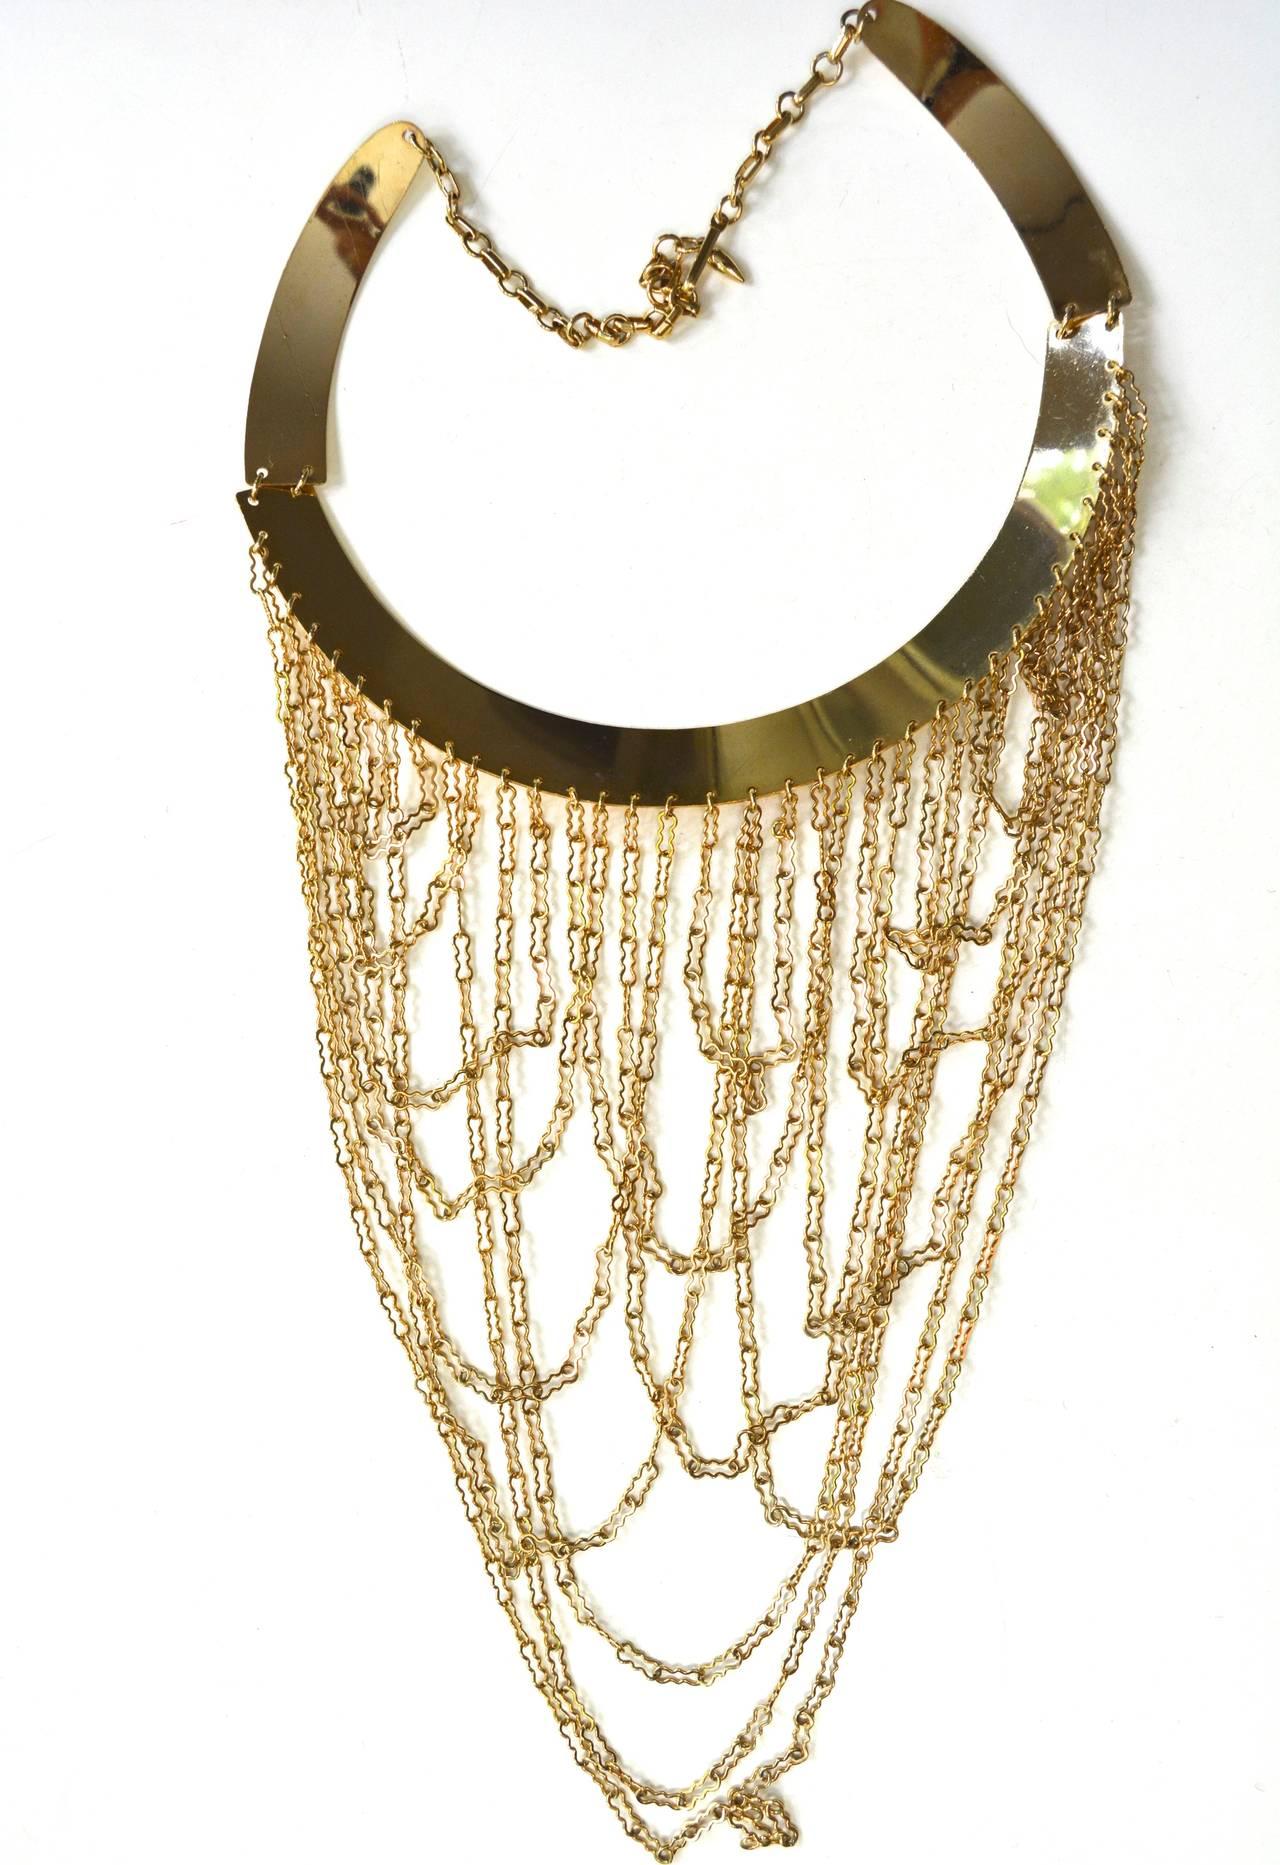 Vendome Cascades Necklace/ Documented 5